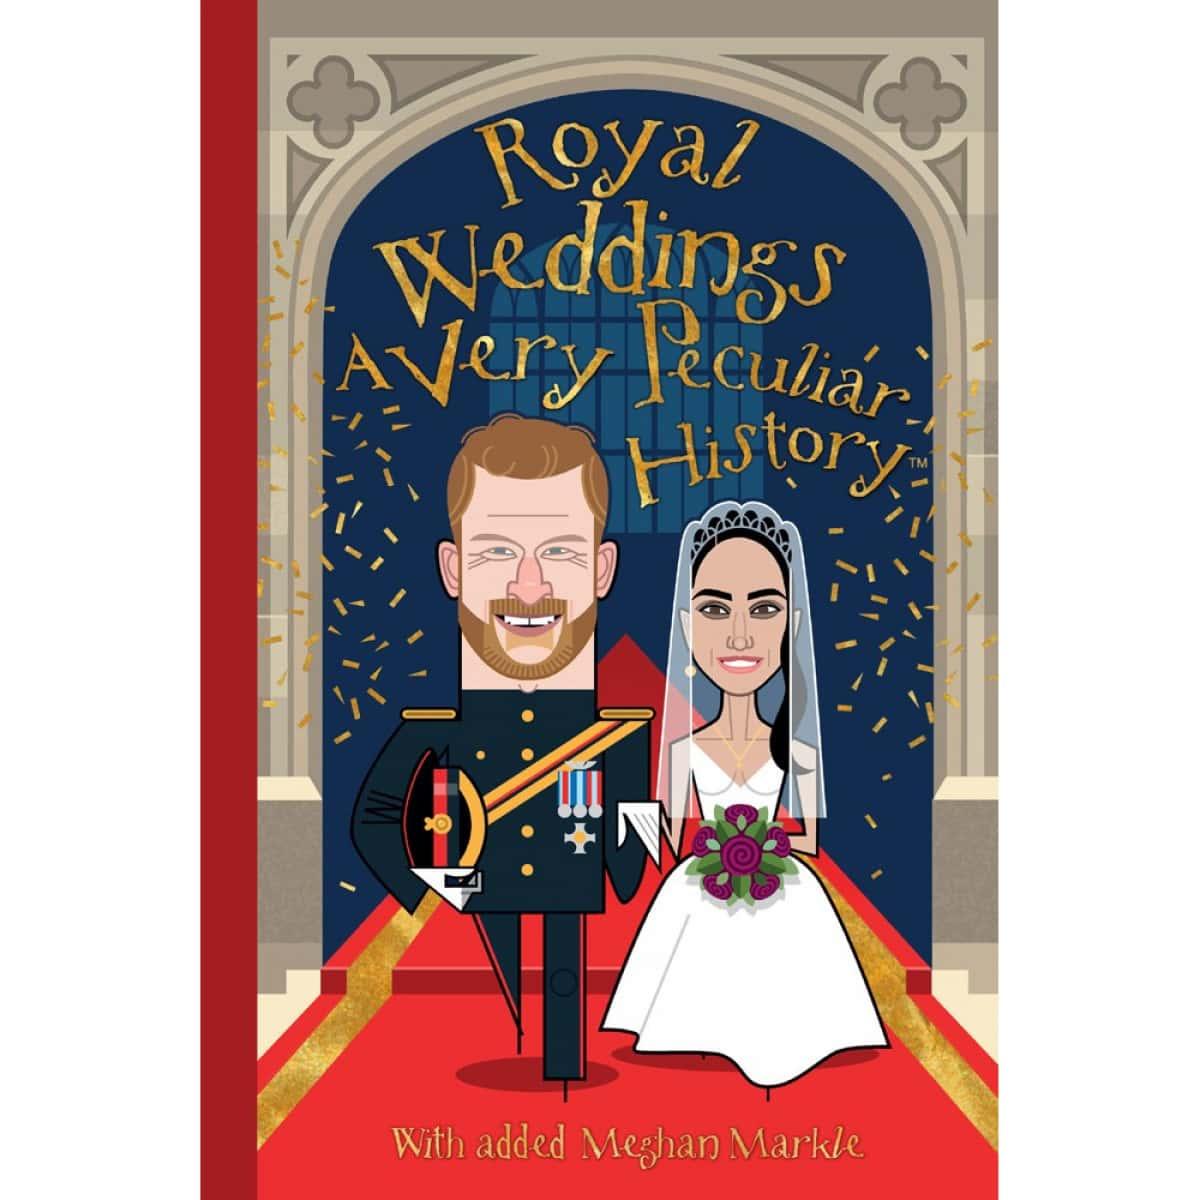 Royal Weddings A Very Peculiar History